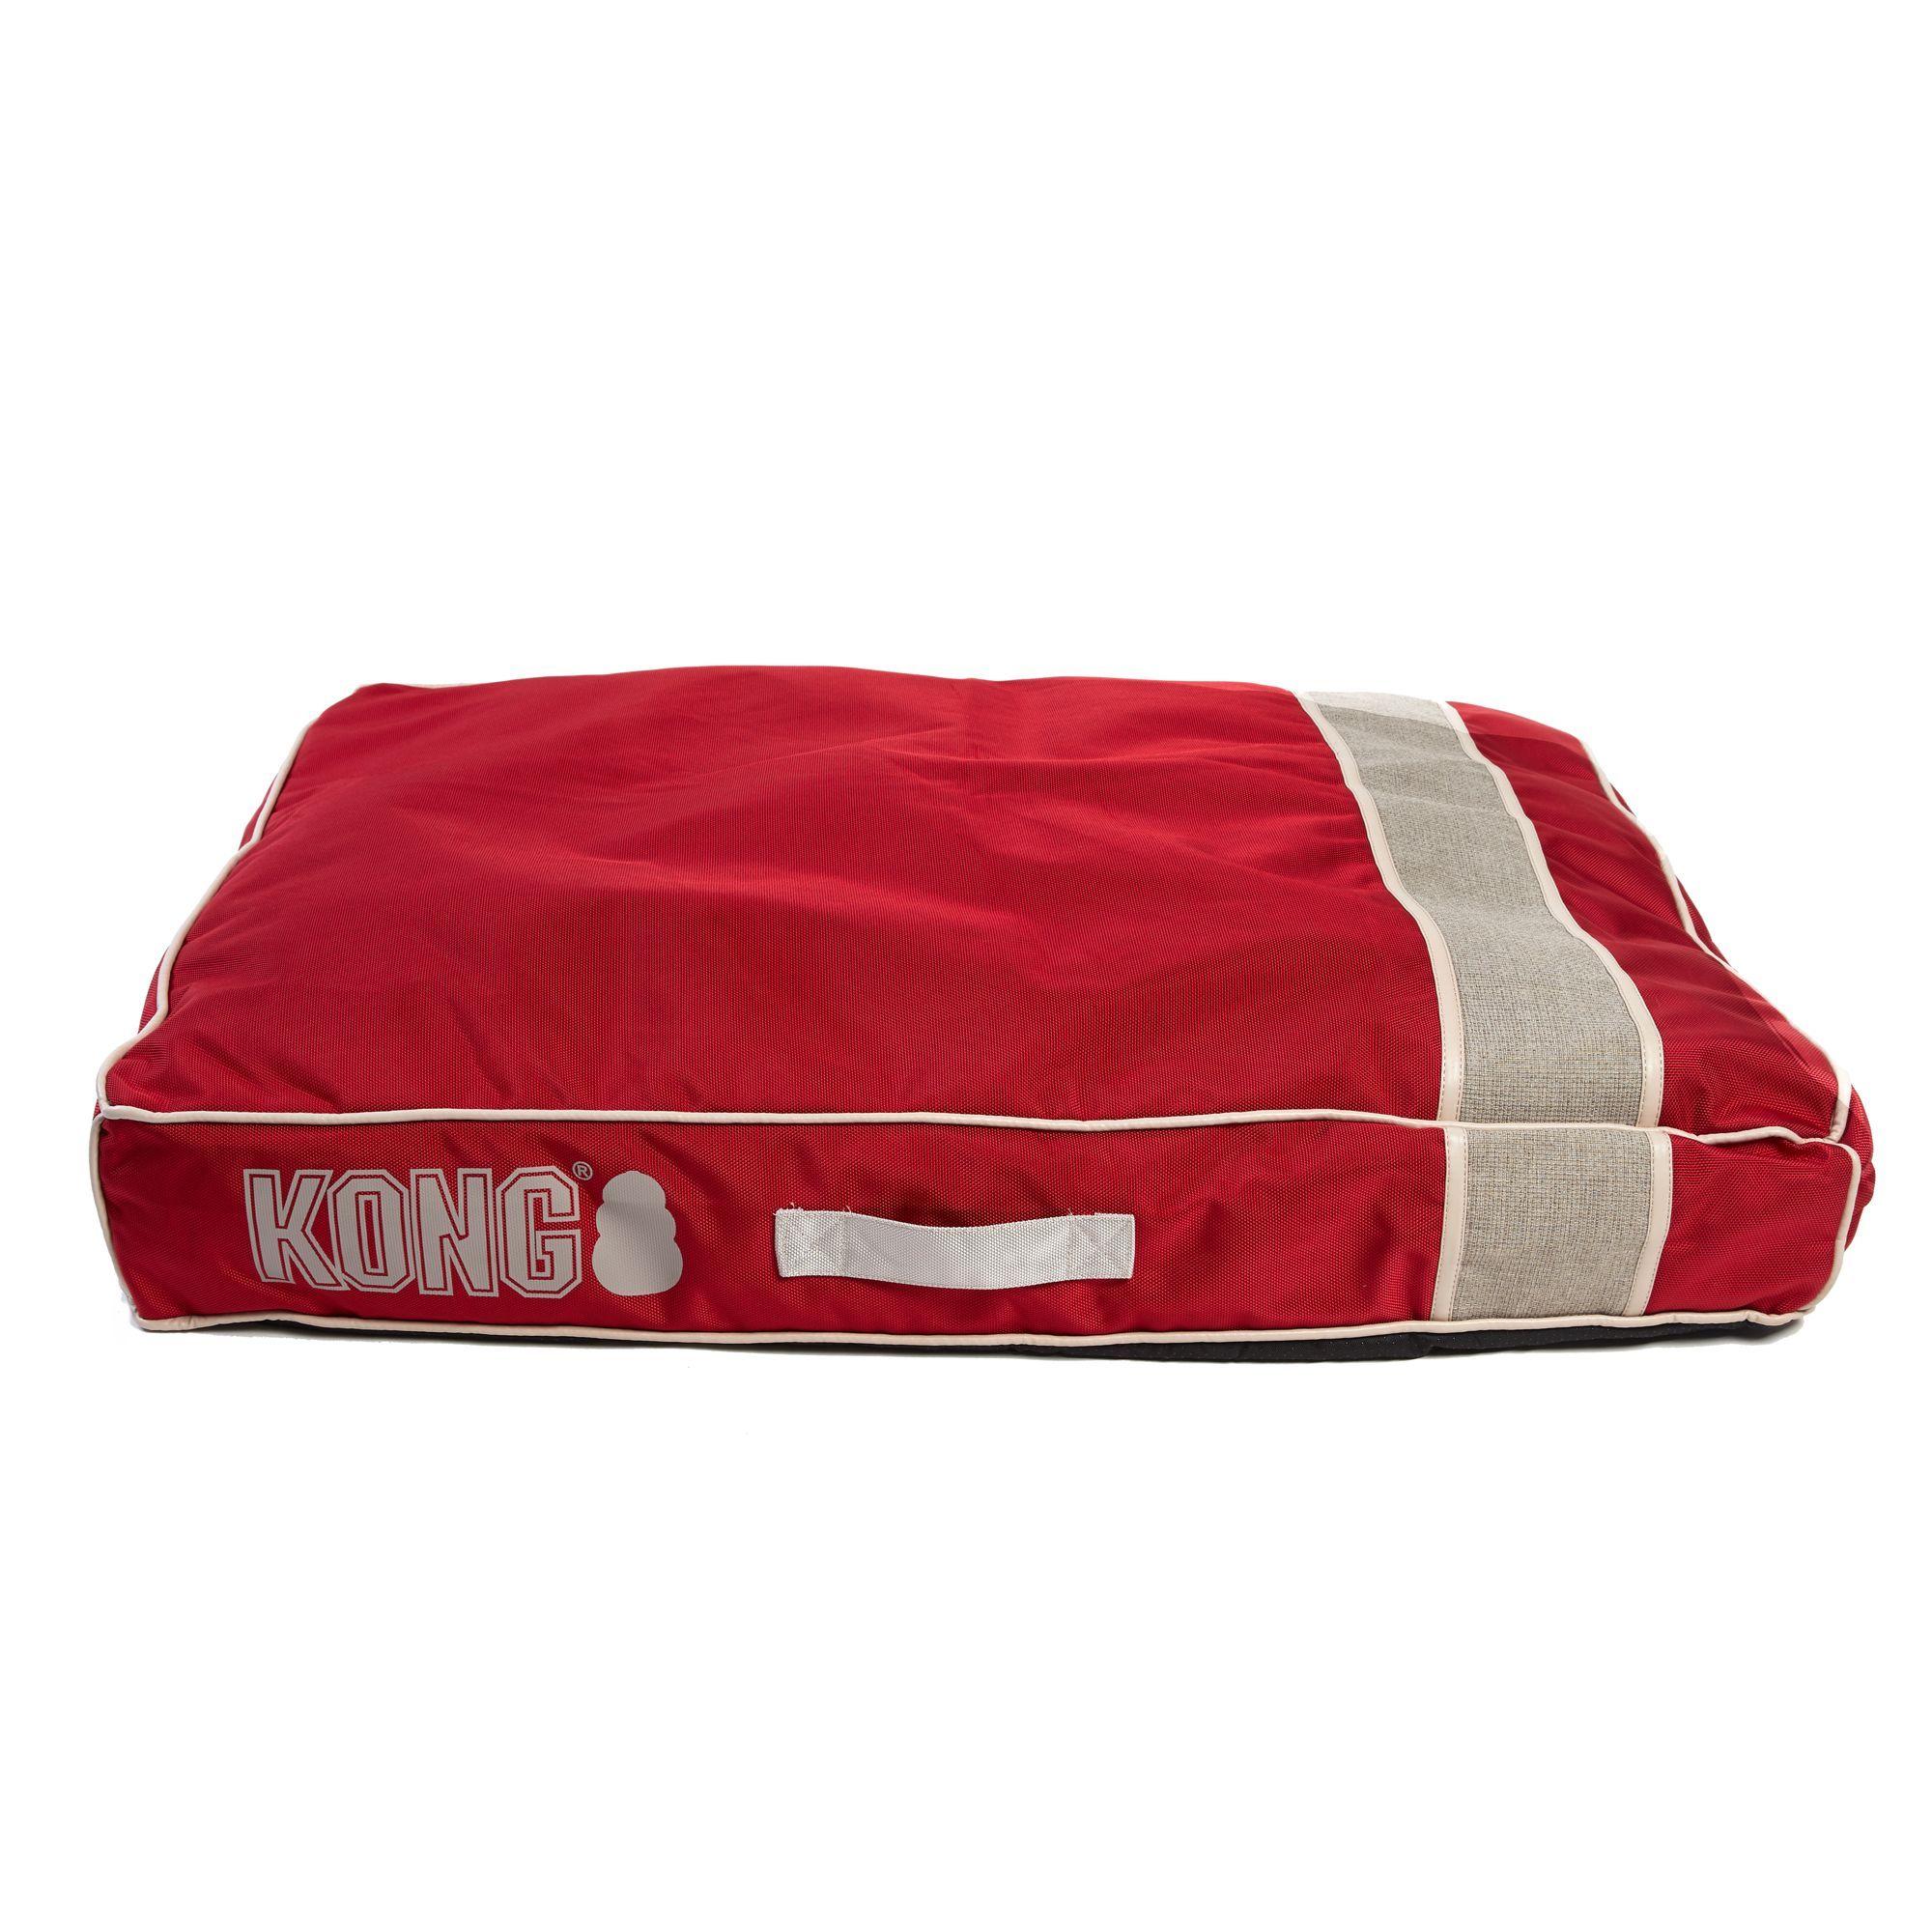 "Kong Mattress Dog Bed size 30""L x 40""W x 5""H, Red Dog"